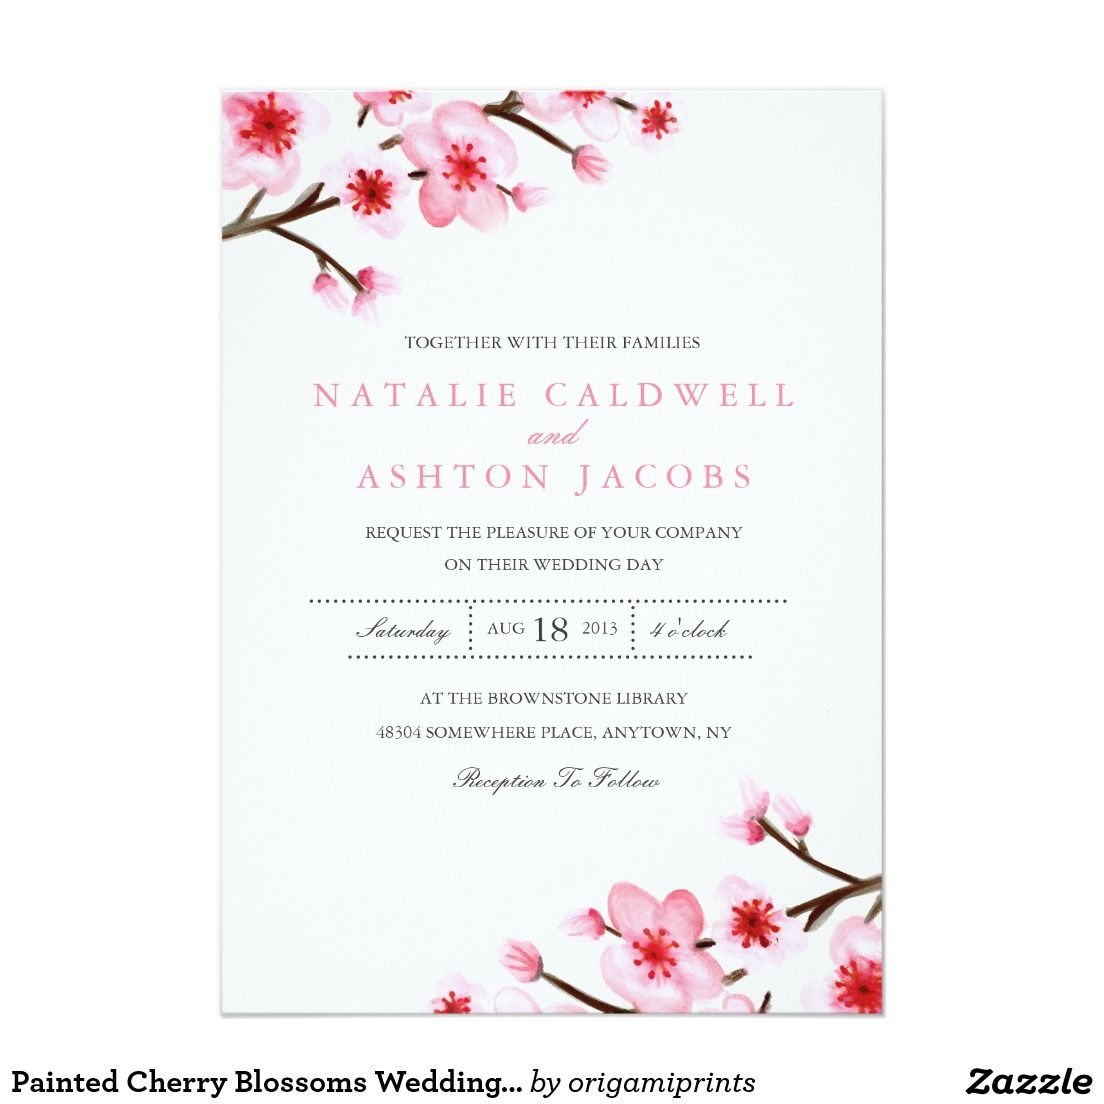 Painted Cherry Blossoms Wedding Invite | WEDDING IDEAS | Pinterest ...